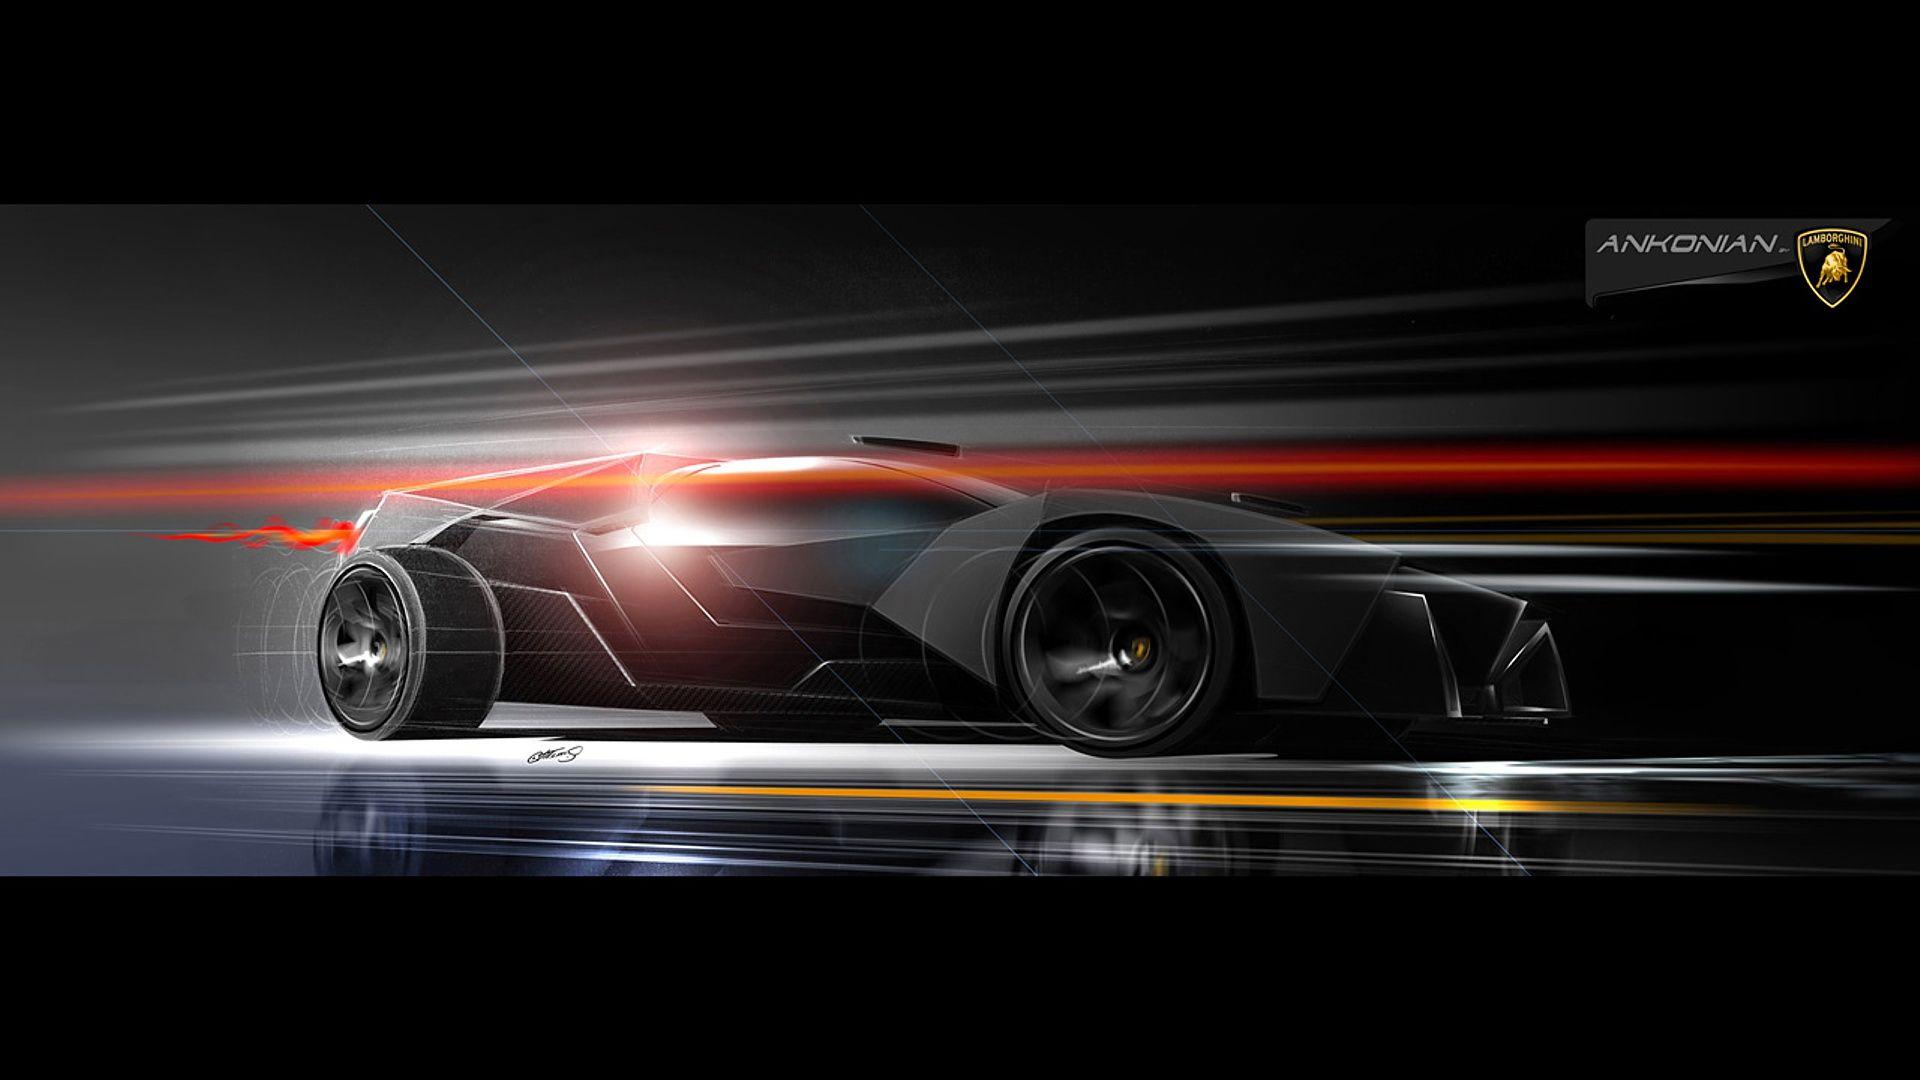 Lamborghini Ankonian Concept On Hd Wallpapers Rom Hotszotseu WallpaperBackgroundsLamborghini8htm